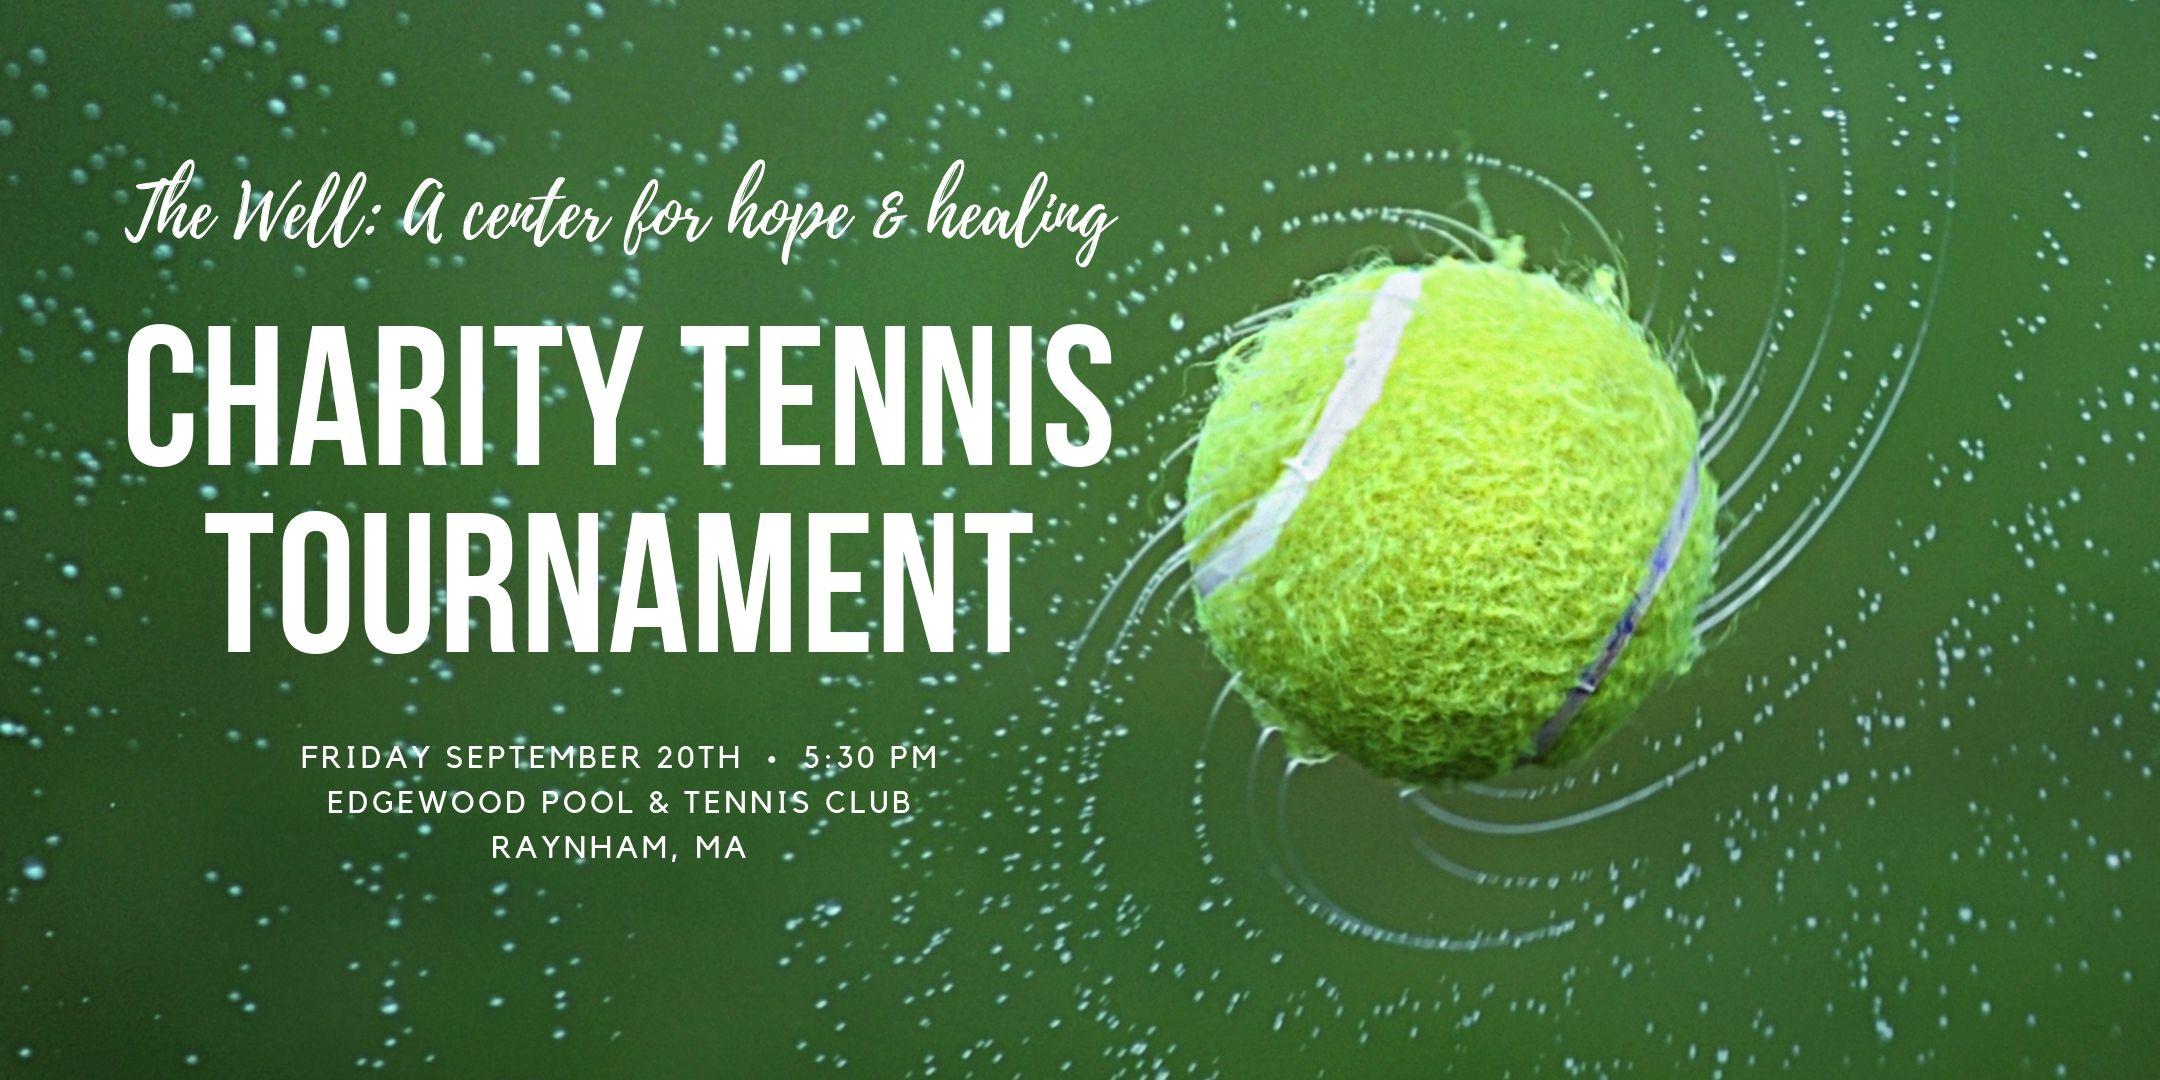 THE WELL Charity Tennis Tournament.jpg